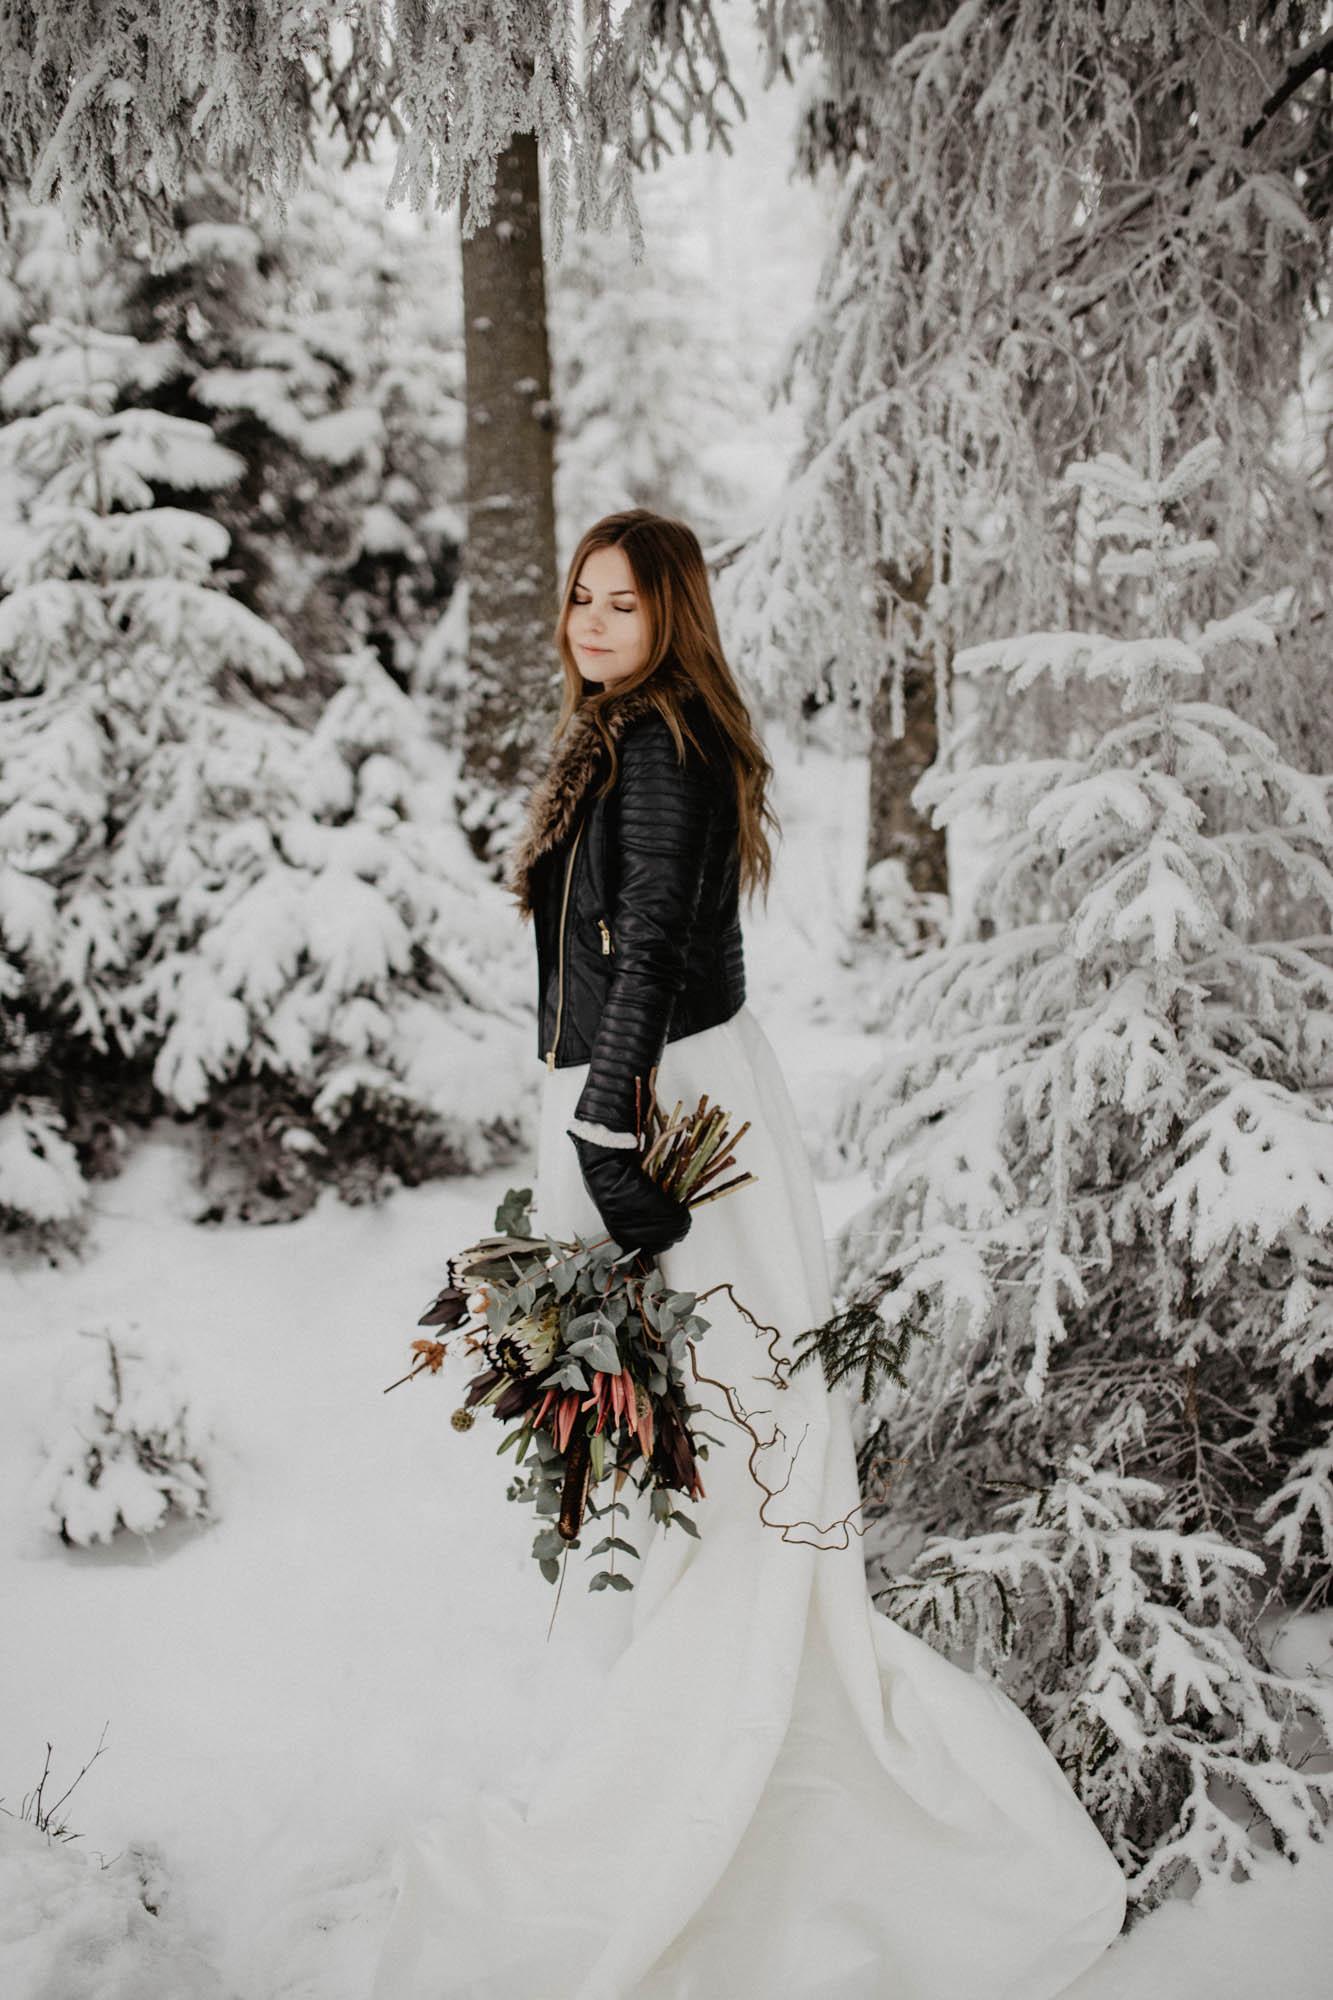 ashley_schulman_photography-winter_wedding_tampere-36.jpg